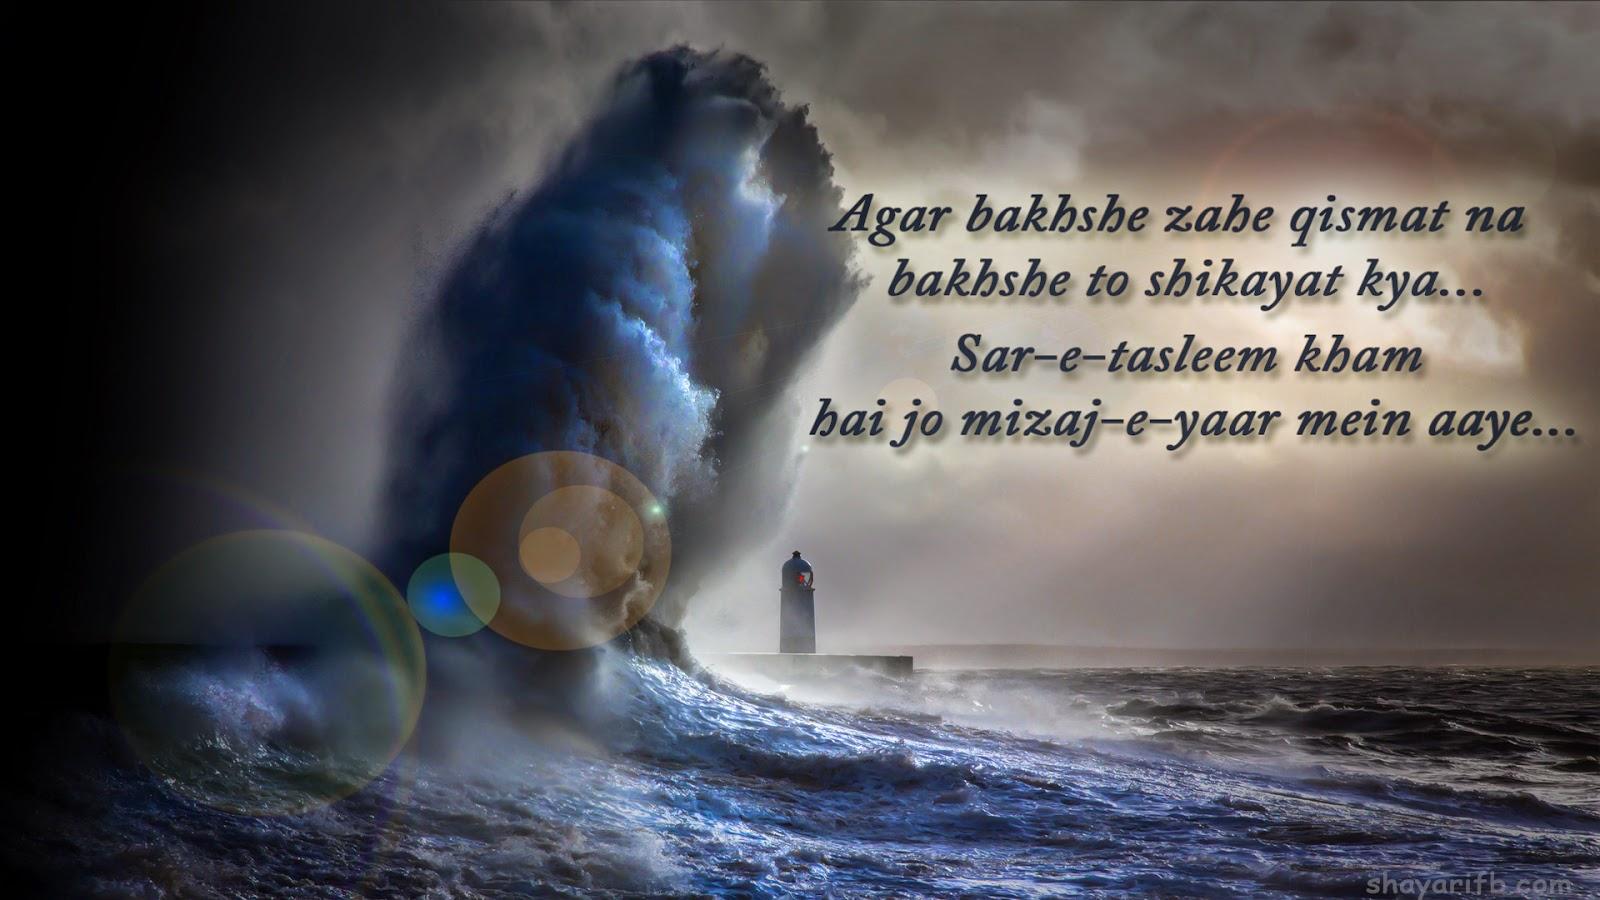 Heart touching love shayari on life moments Download HD ...